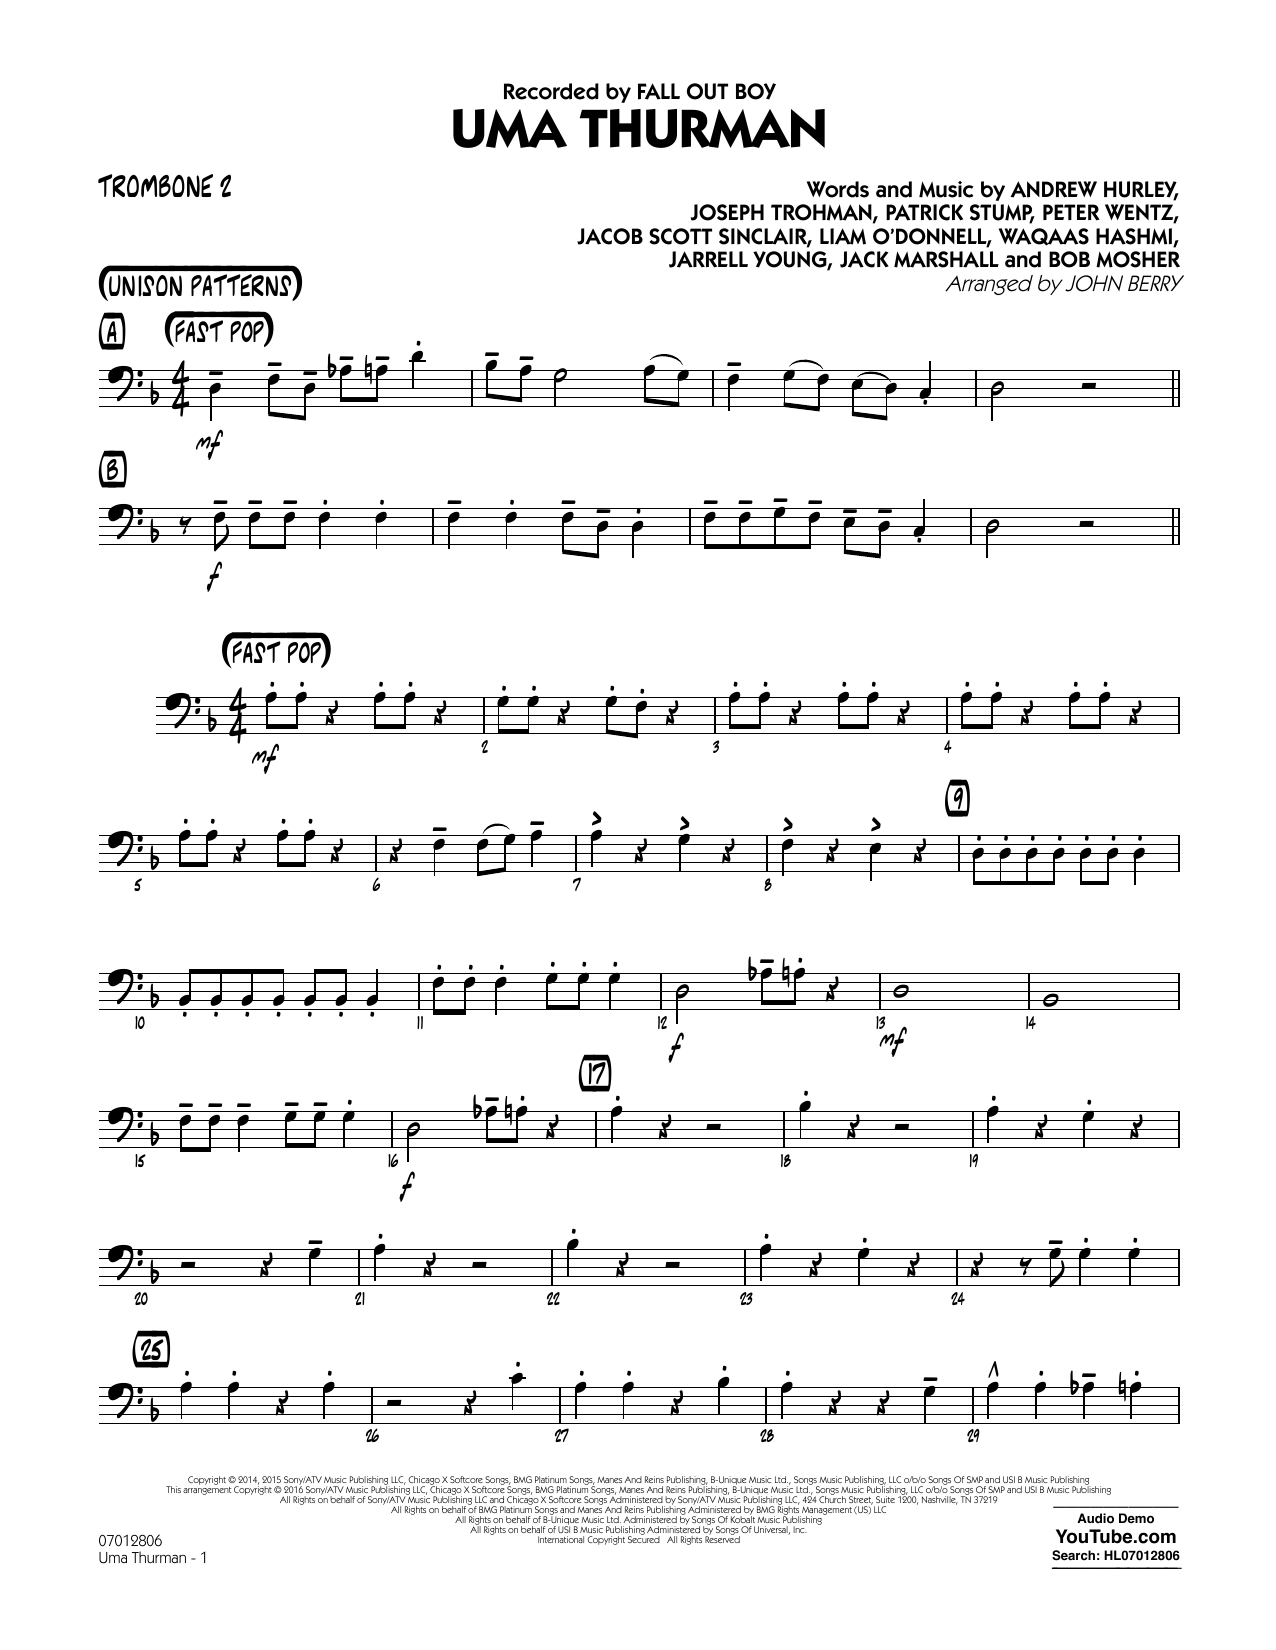 Fall Out Boy - Uma Thurman - Trombone 2